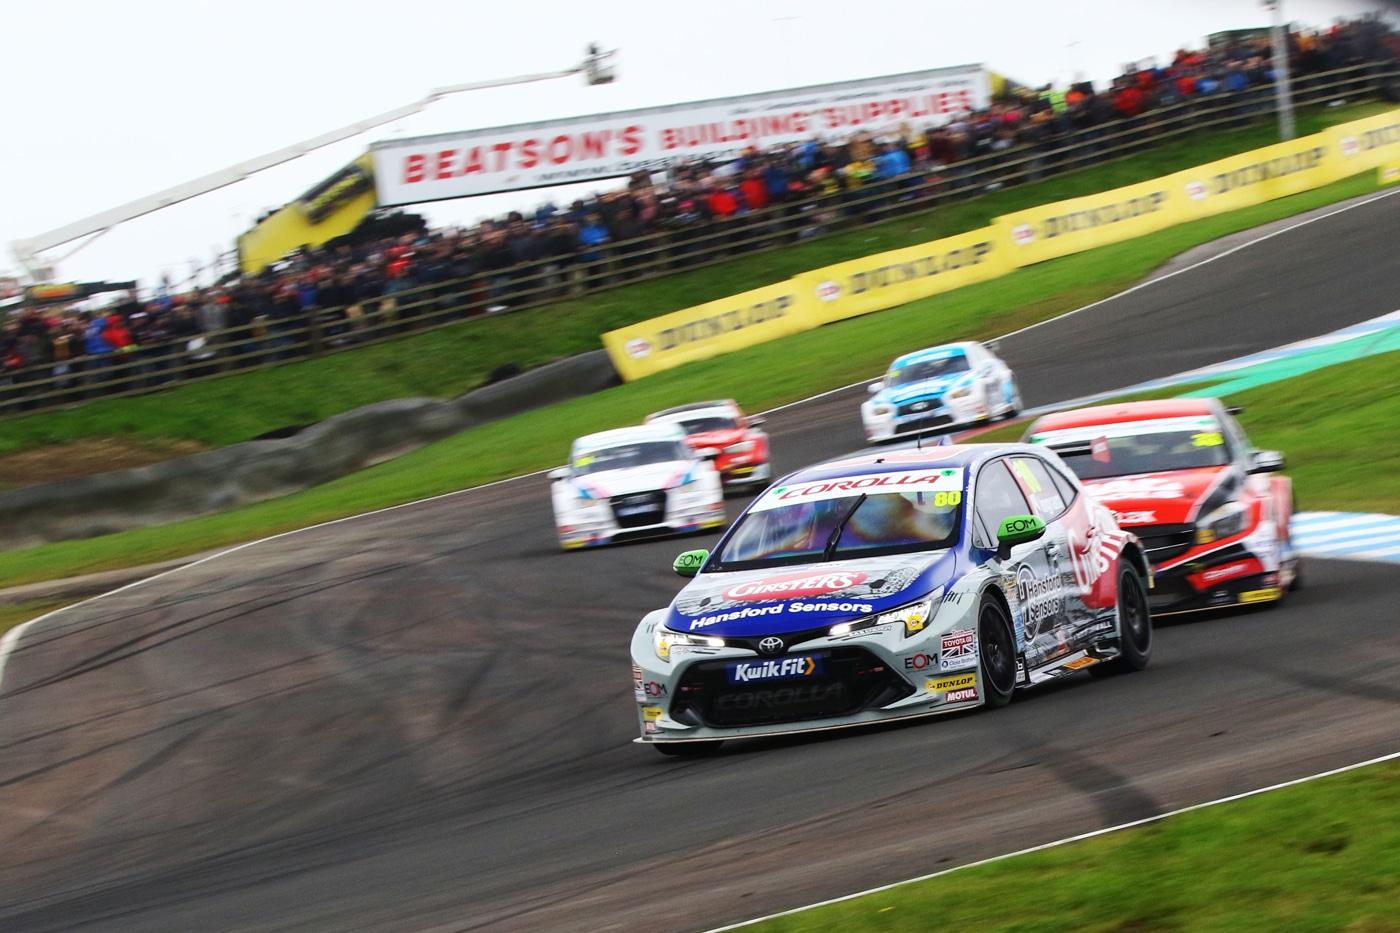 Ingram taking a corner at speed with cars trailing